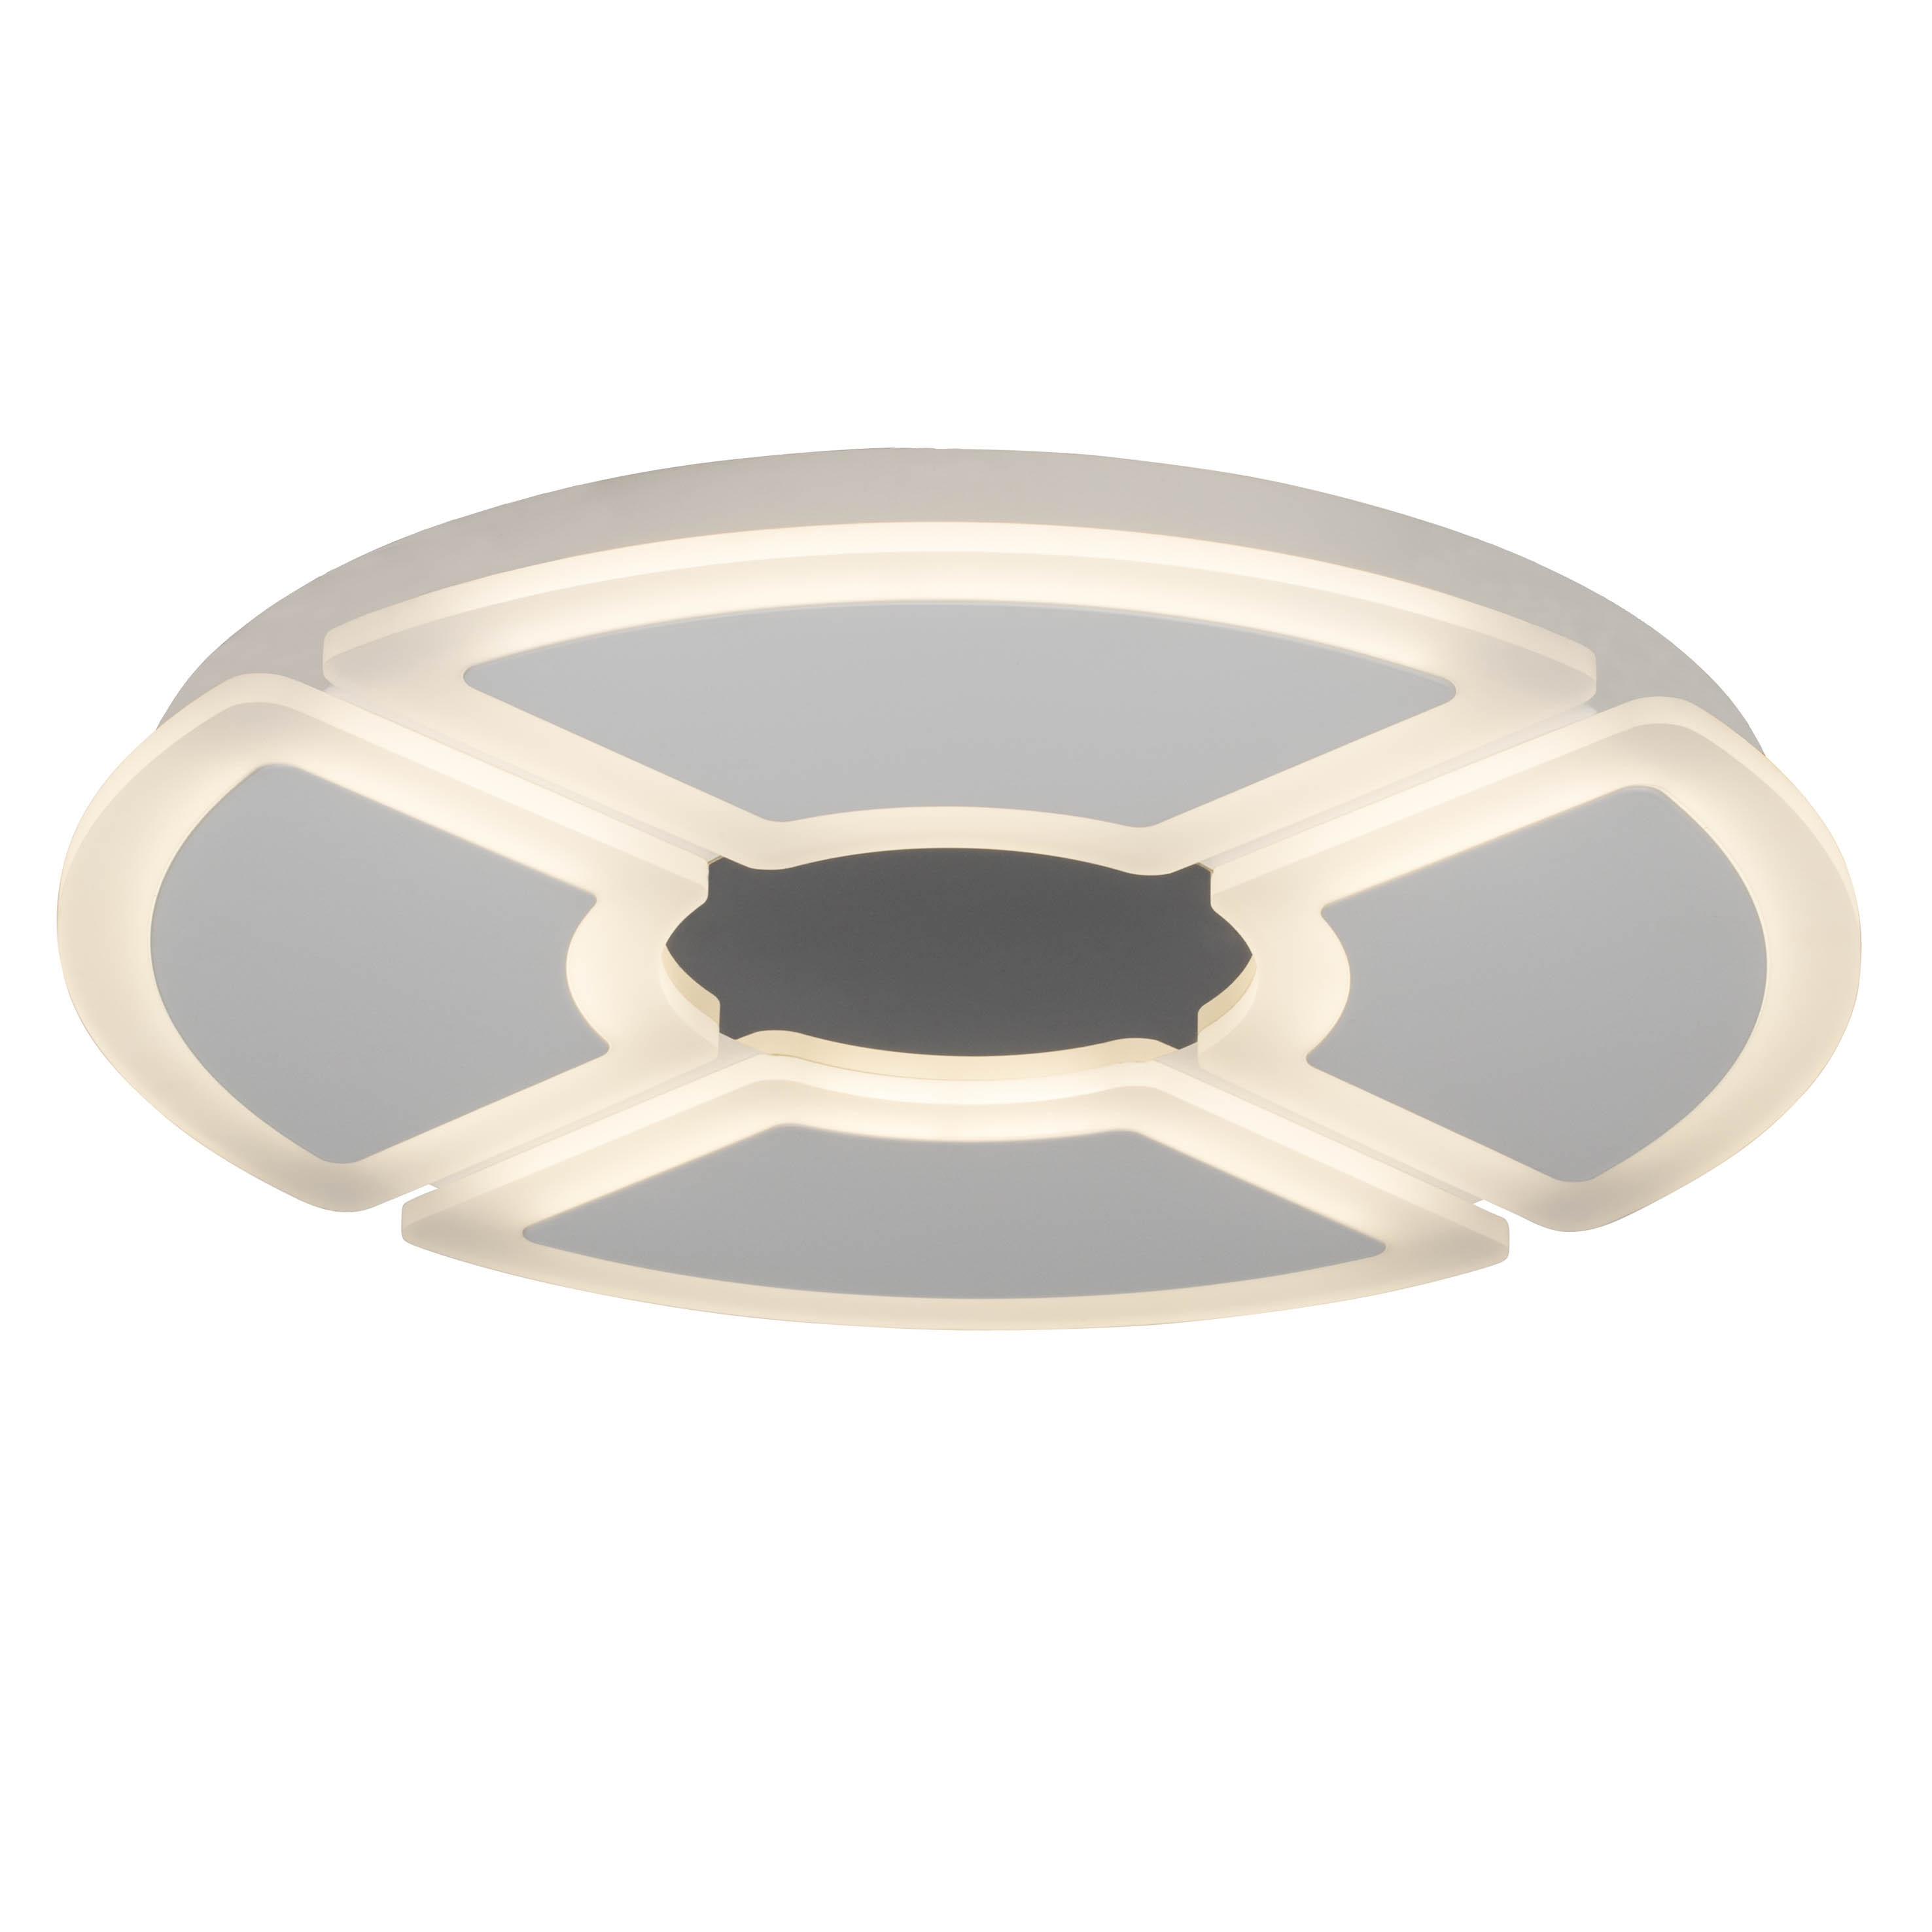 AEG Orv LED Deckenleuchte 60cm weiß/chrom